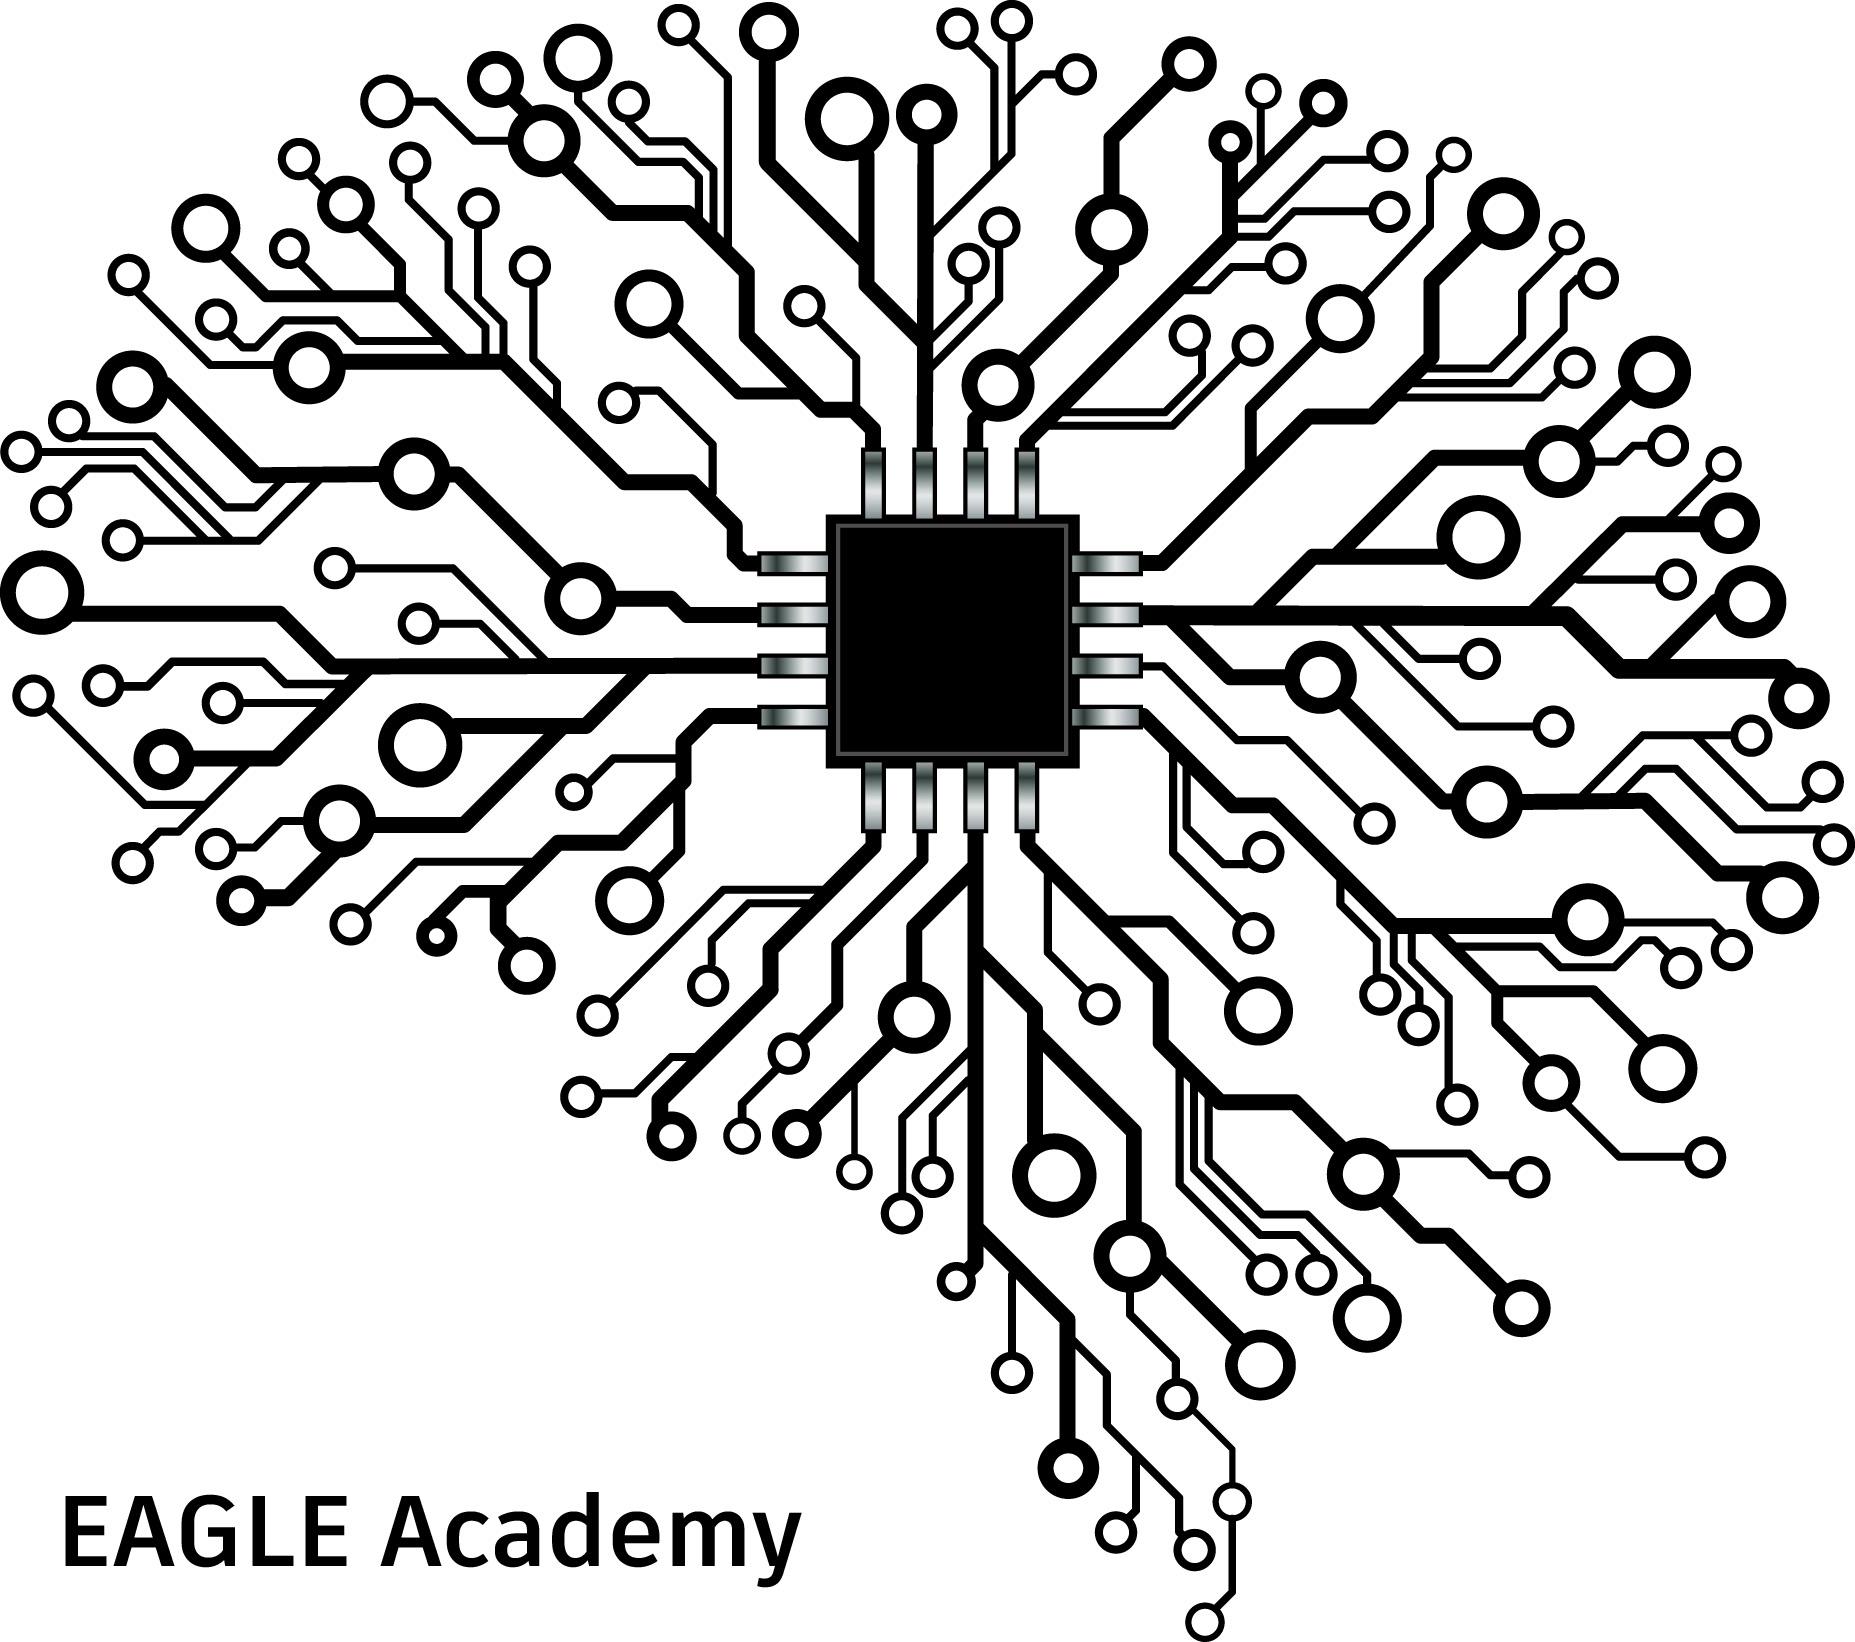 Marvelous Schematic Basics Part 1 Search Place Move Eagle Blog Wiring Cloud Filiciilluminateatxorg